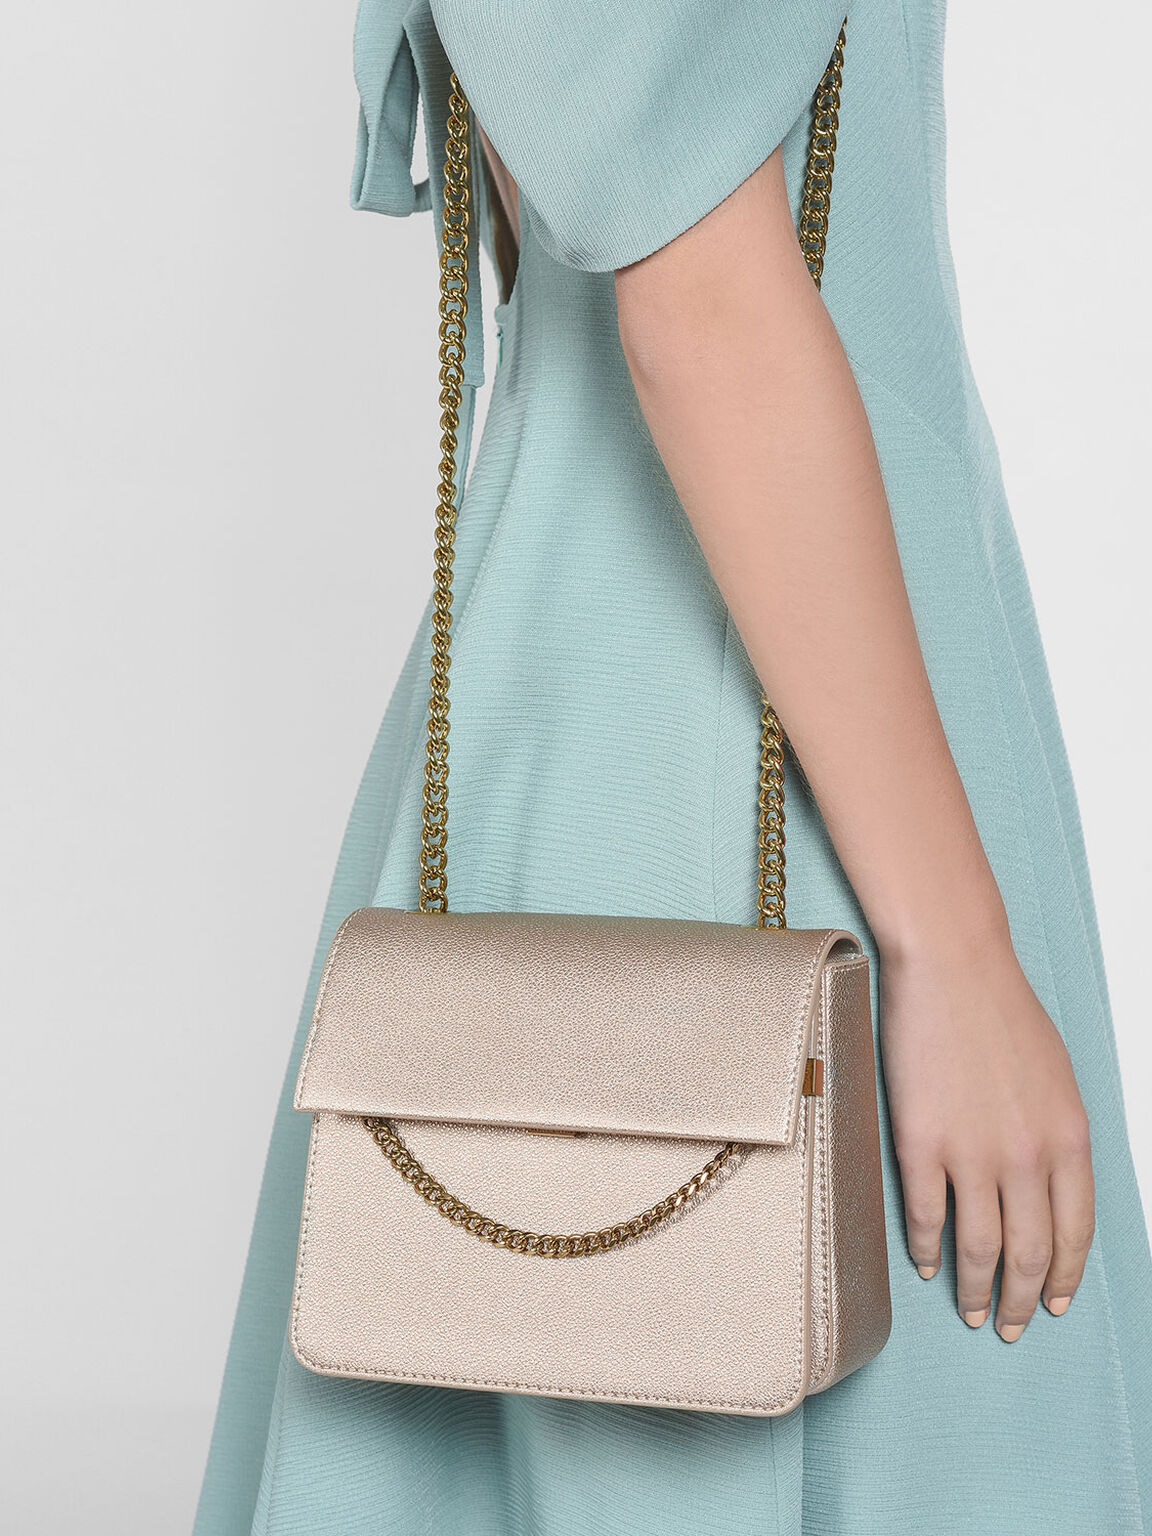 Chain Detail Front Flap Bag, Rose Gold, hi-res